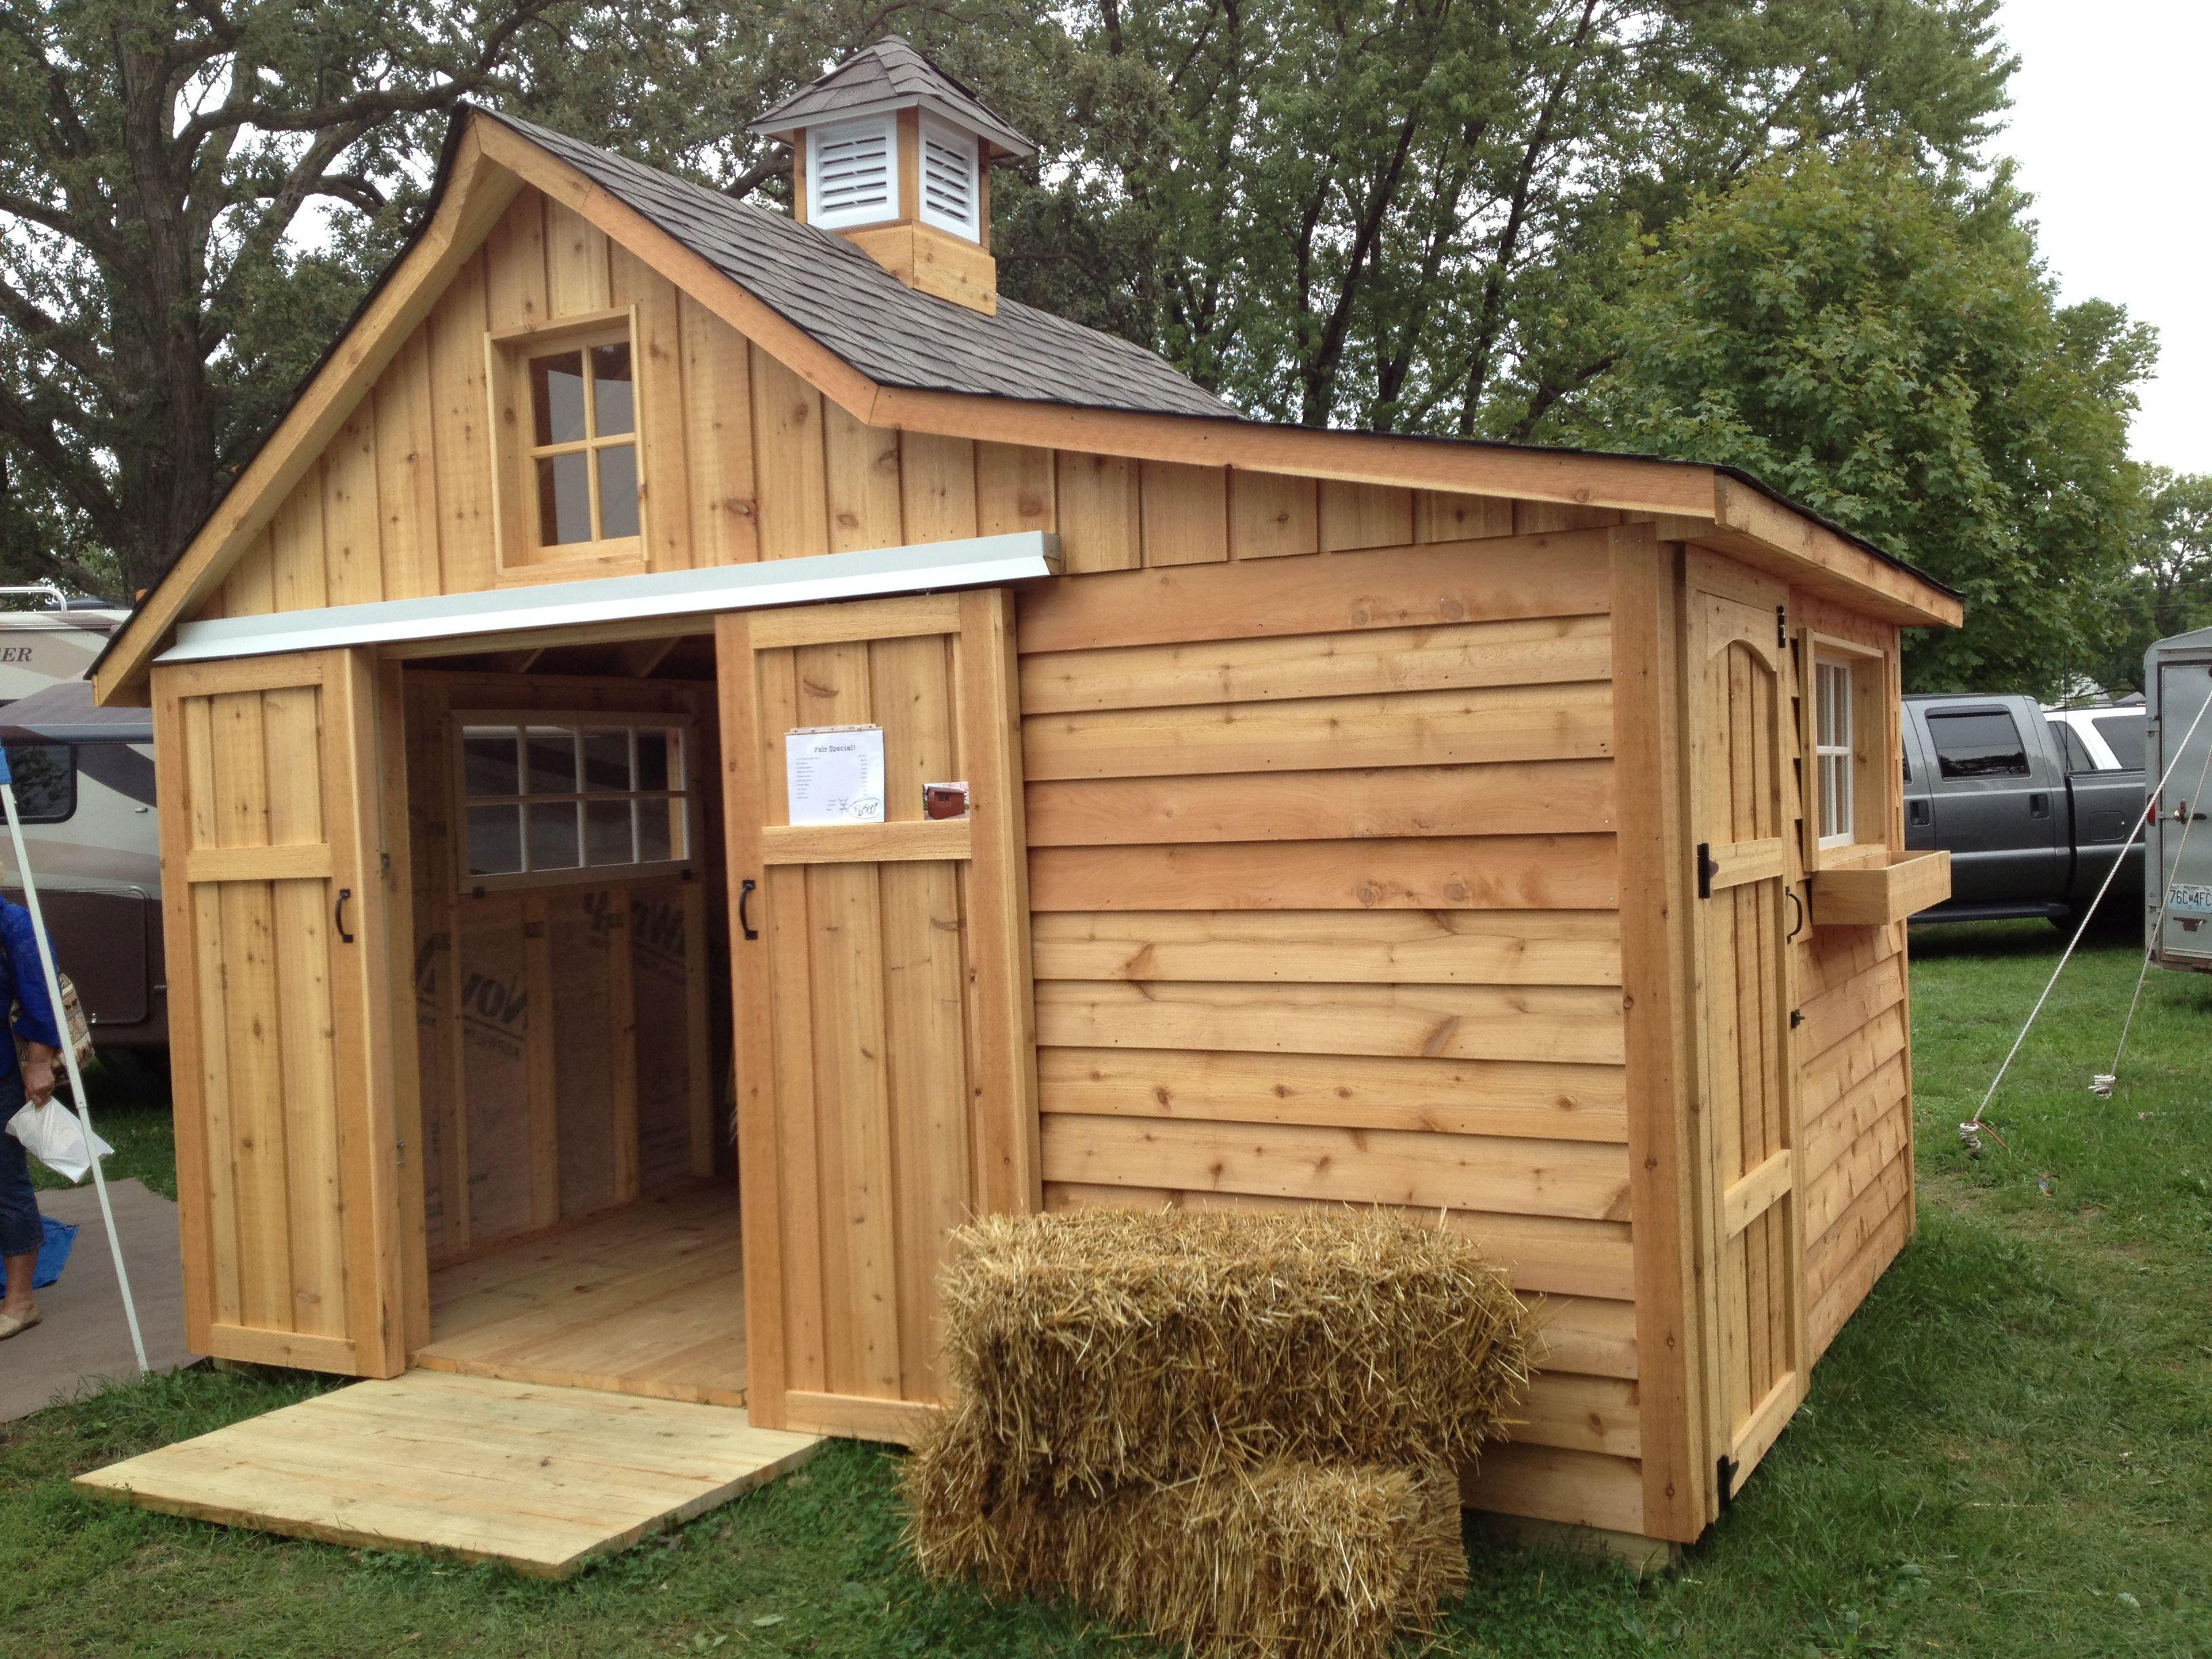 A Tiny Barn For My Tiny Horse! Www.shedcraft.com (Chicken Backyard